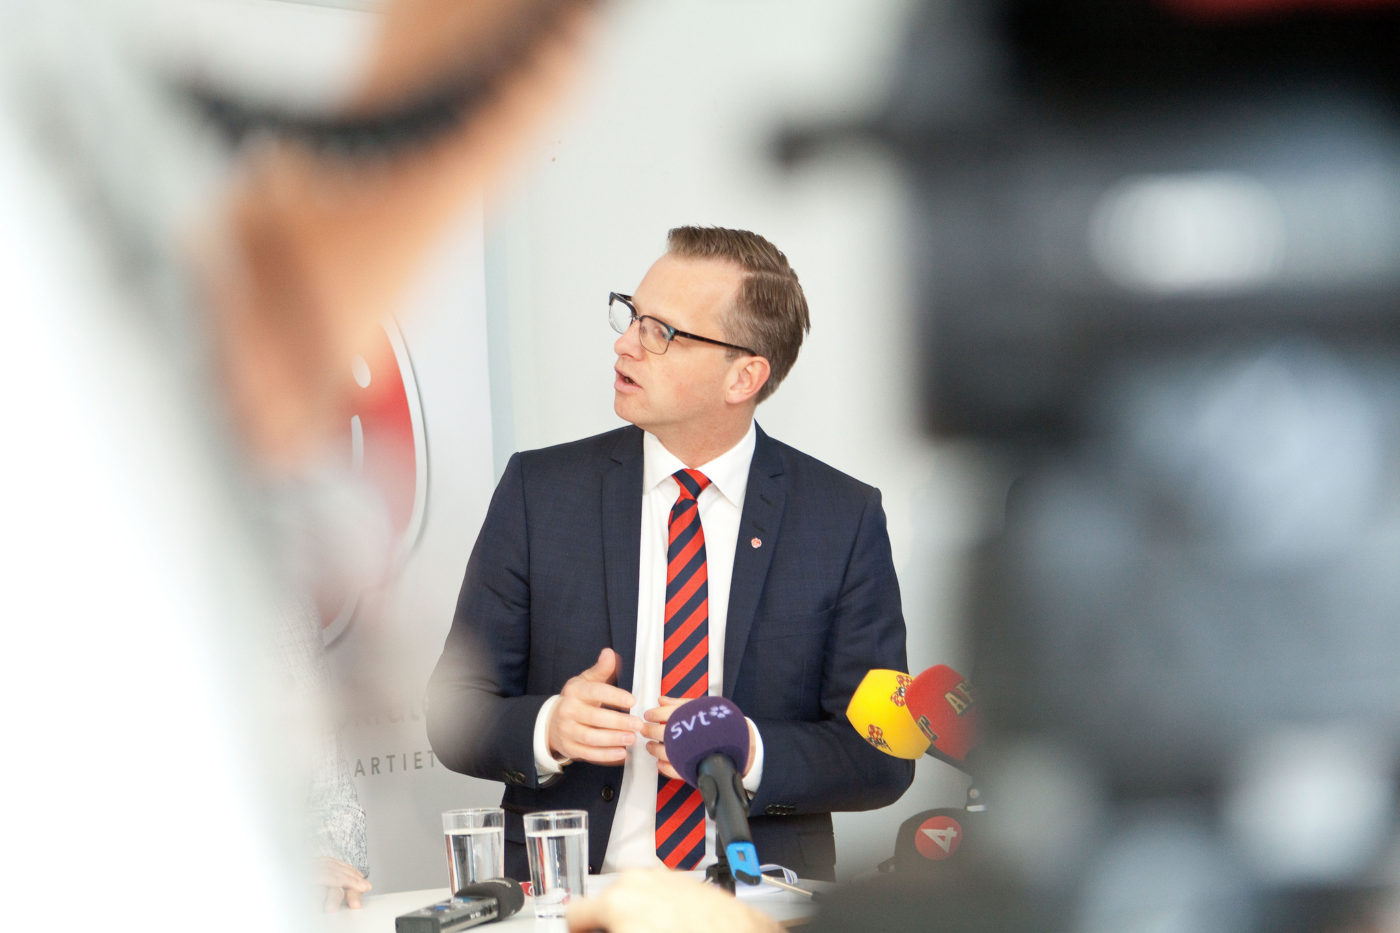 <![CDATA[Näringsminister Mikael Damberg. Foto: Phil Jamieson.]]>